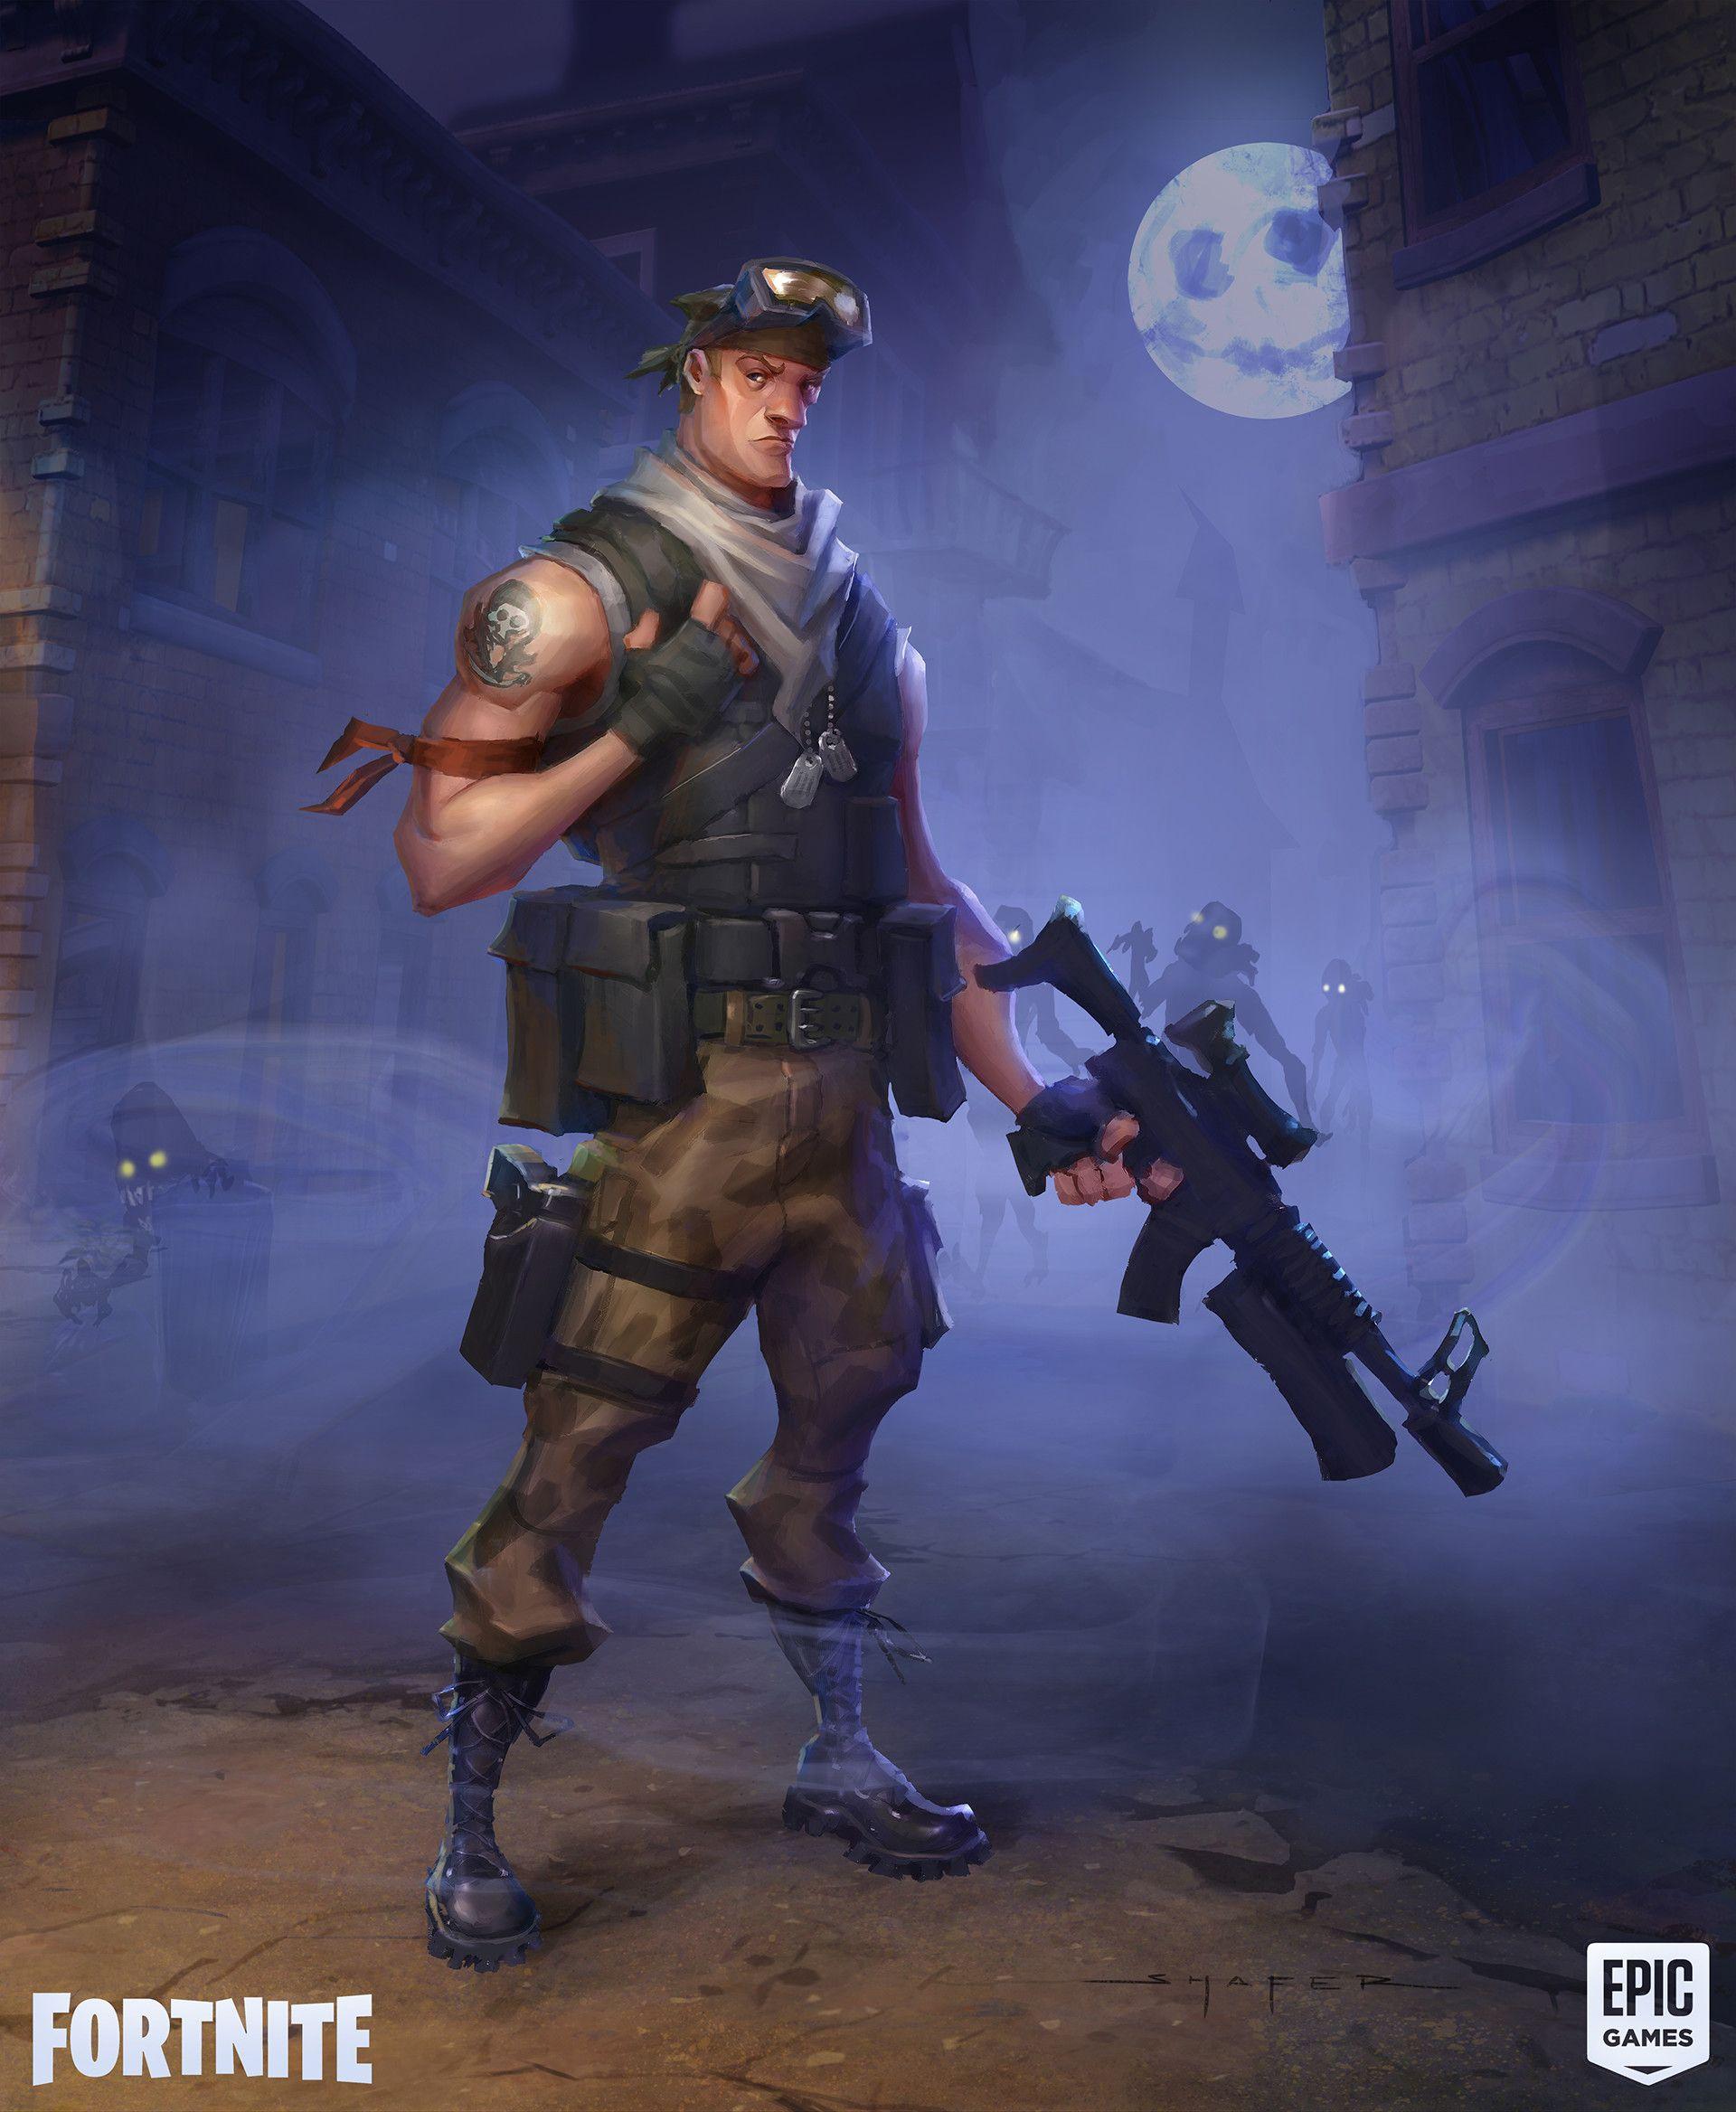 Artstation Fortnite Commando Concepts Ben Shafer Sketches And